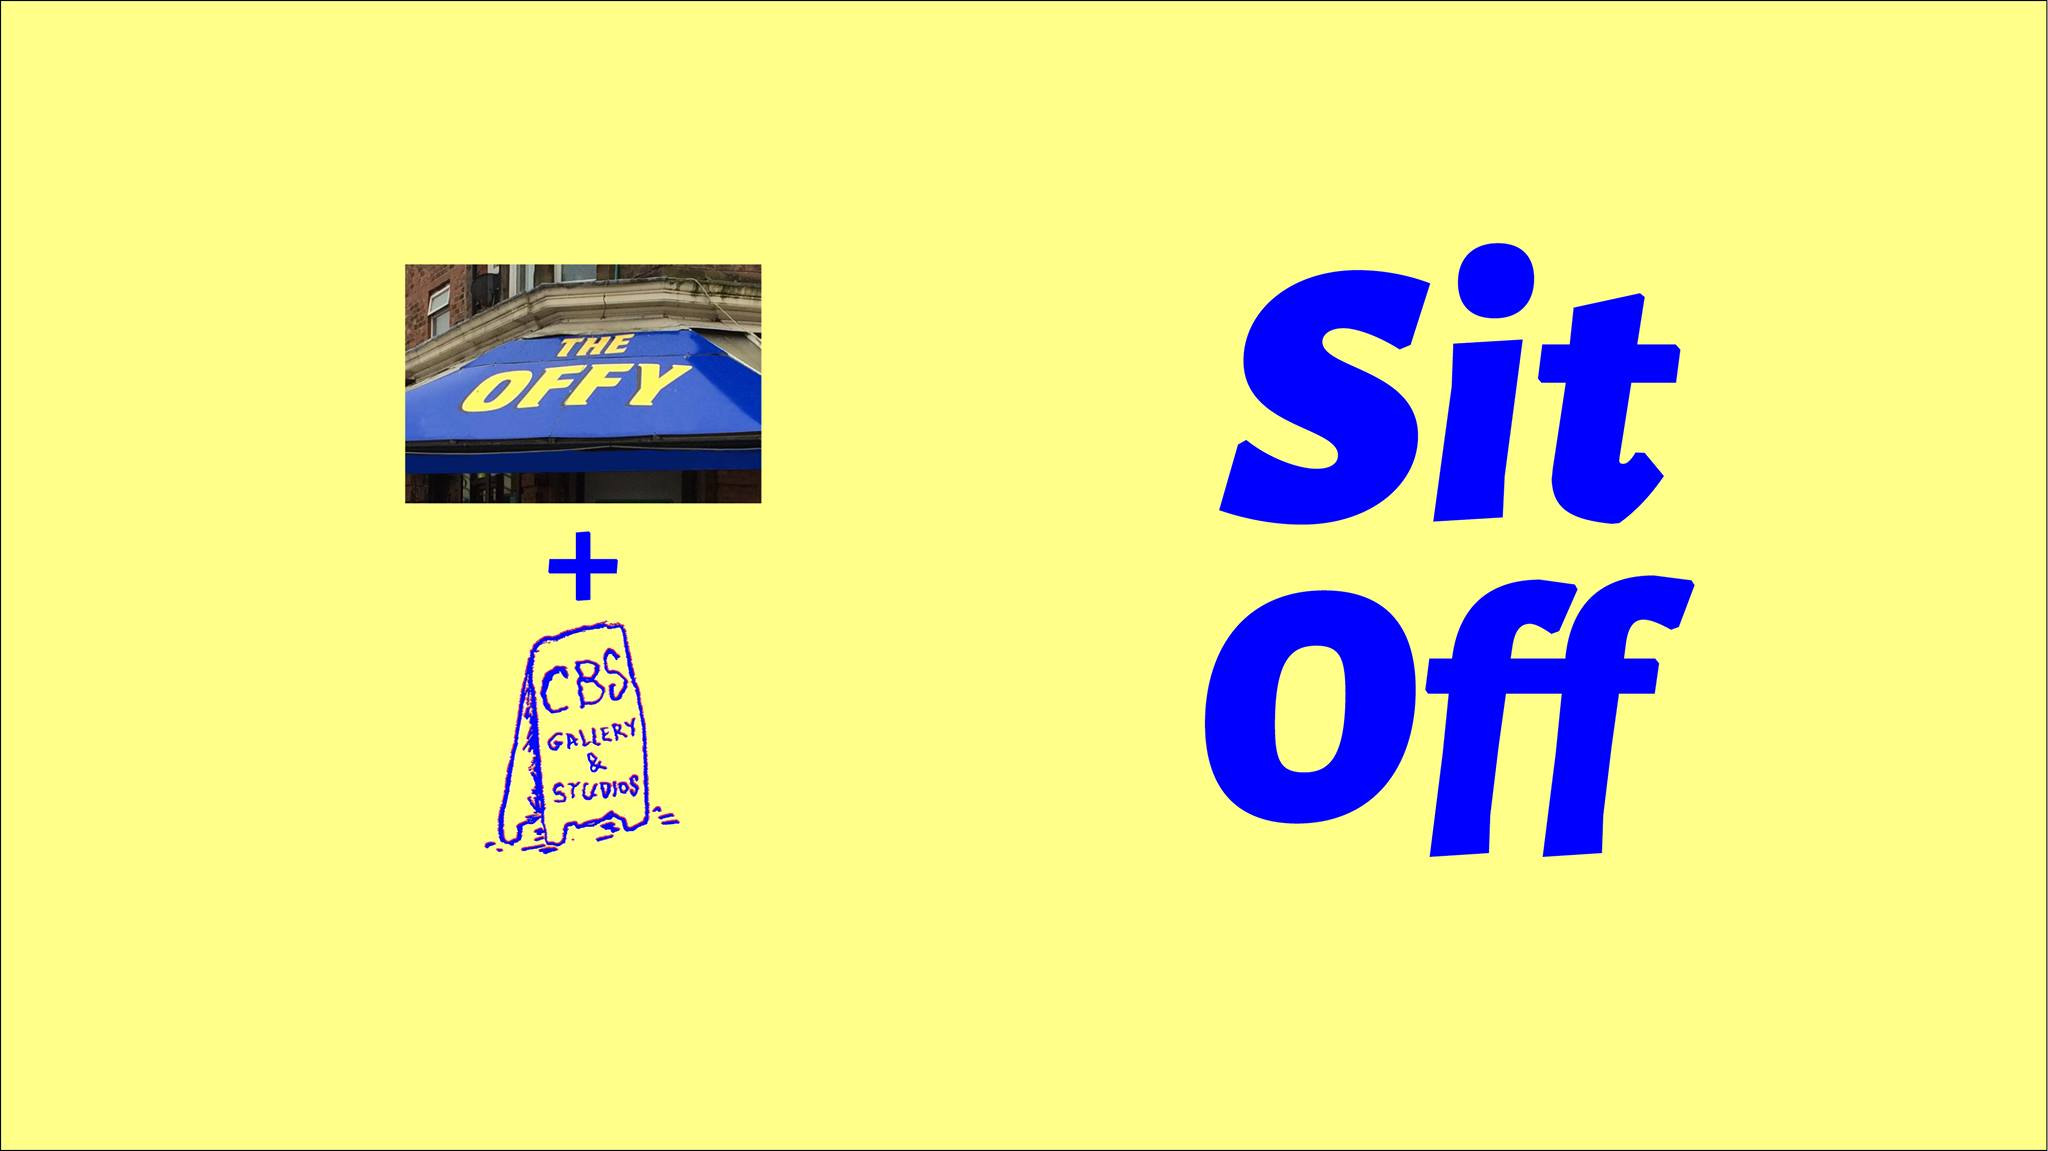 CBS: Sit Off